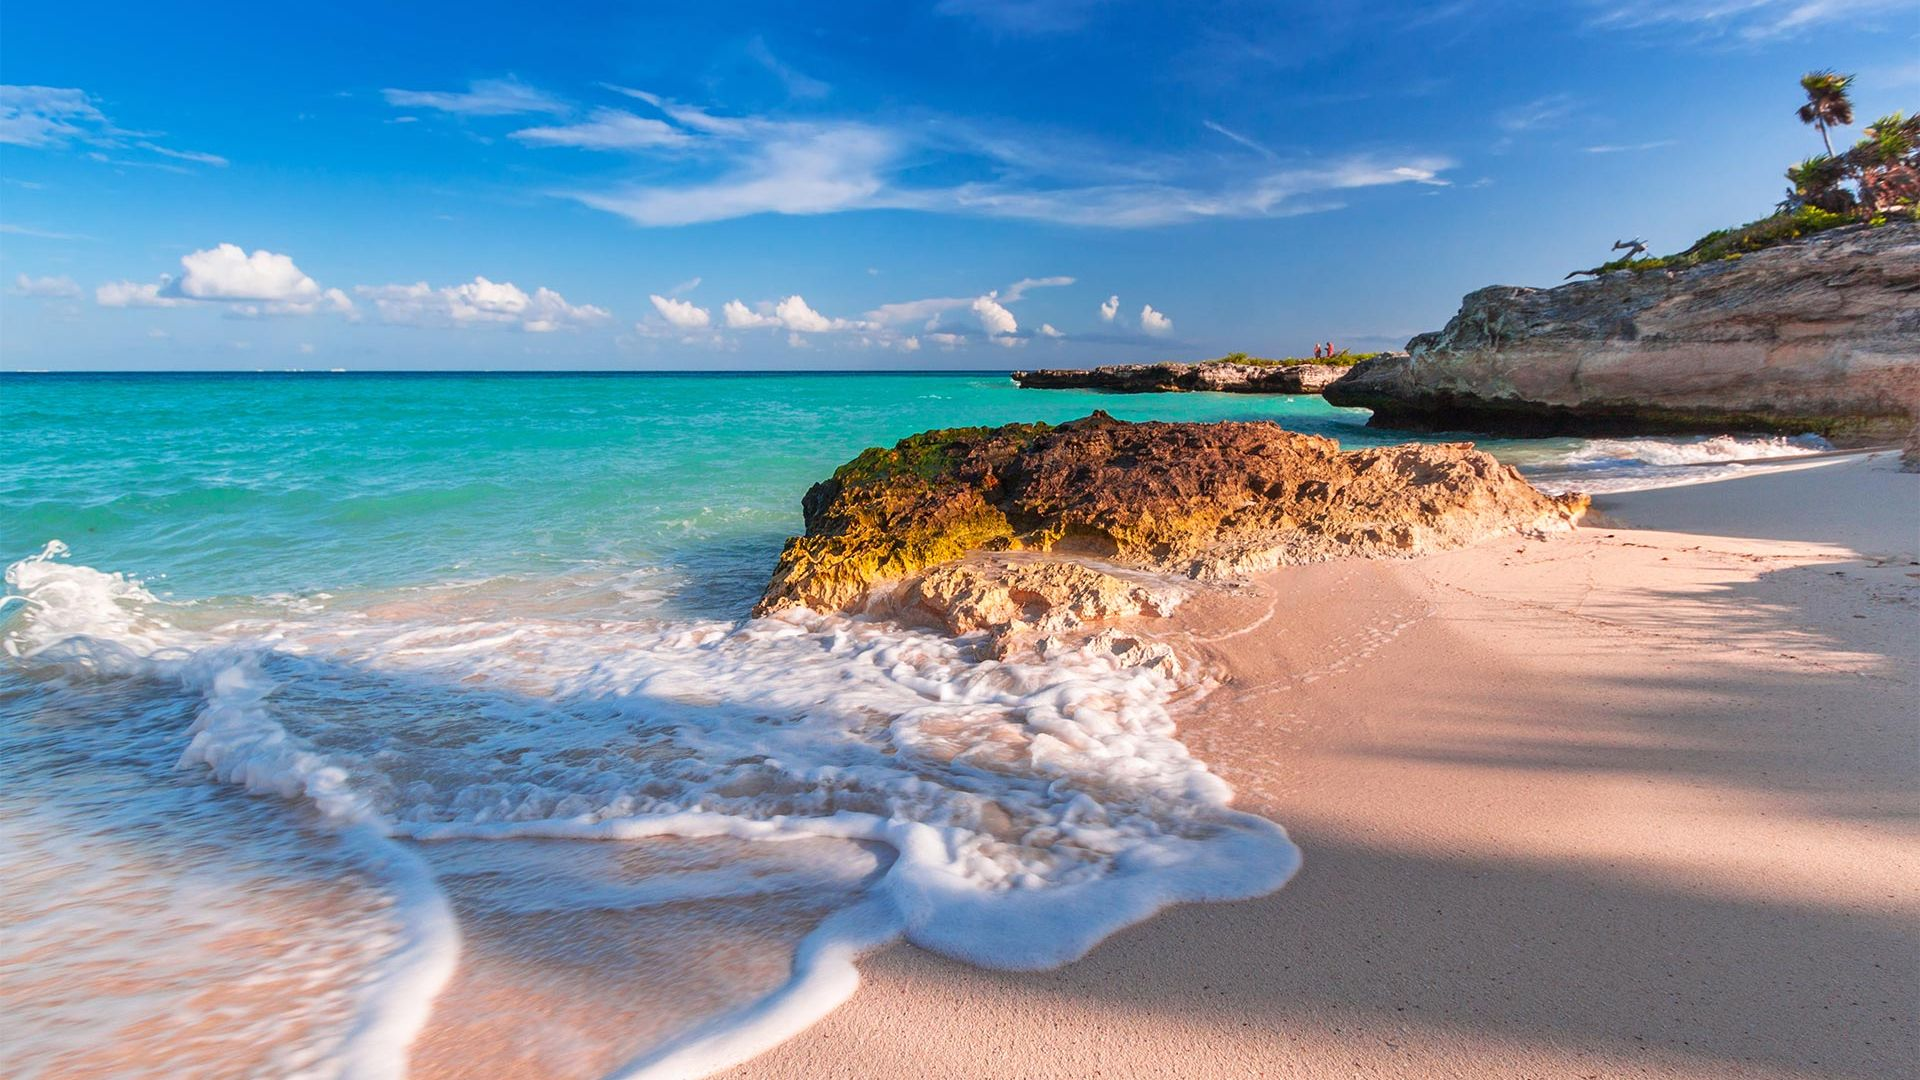 Paste 2022 - Sejur plaja Cancun si Riviera Maya, Mexic, 11 zile